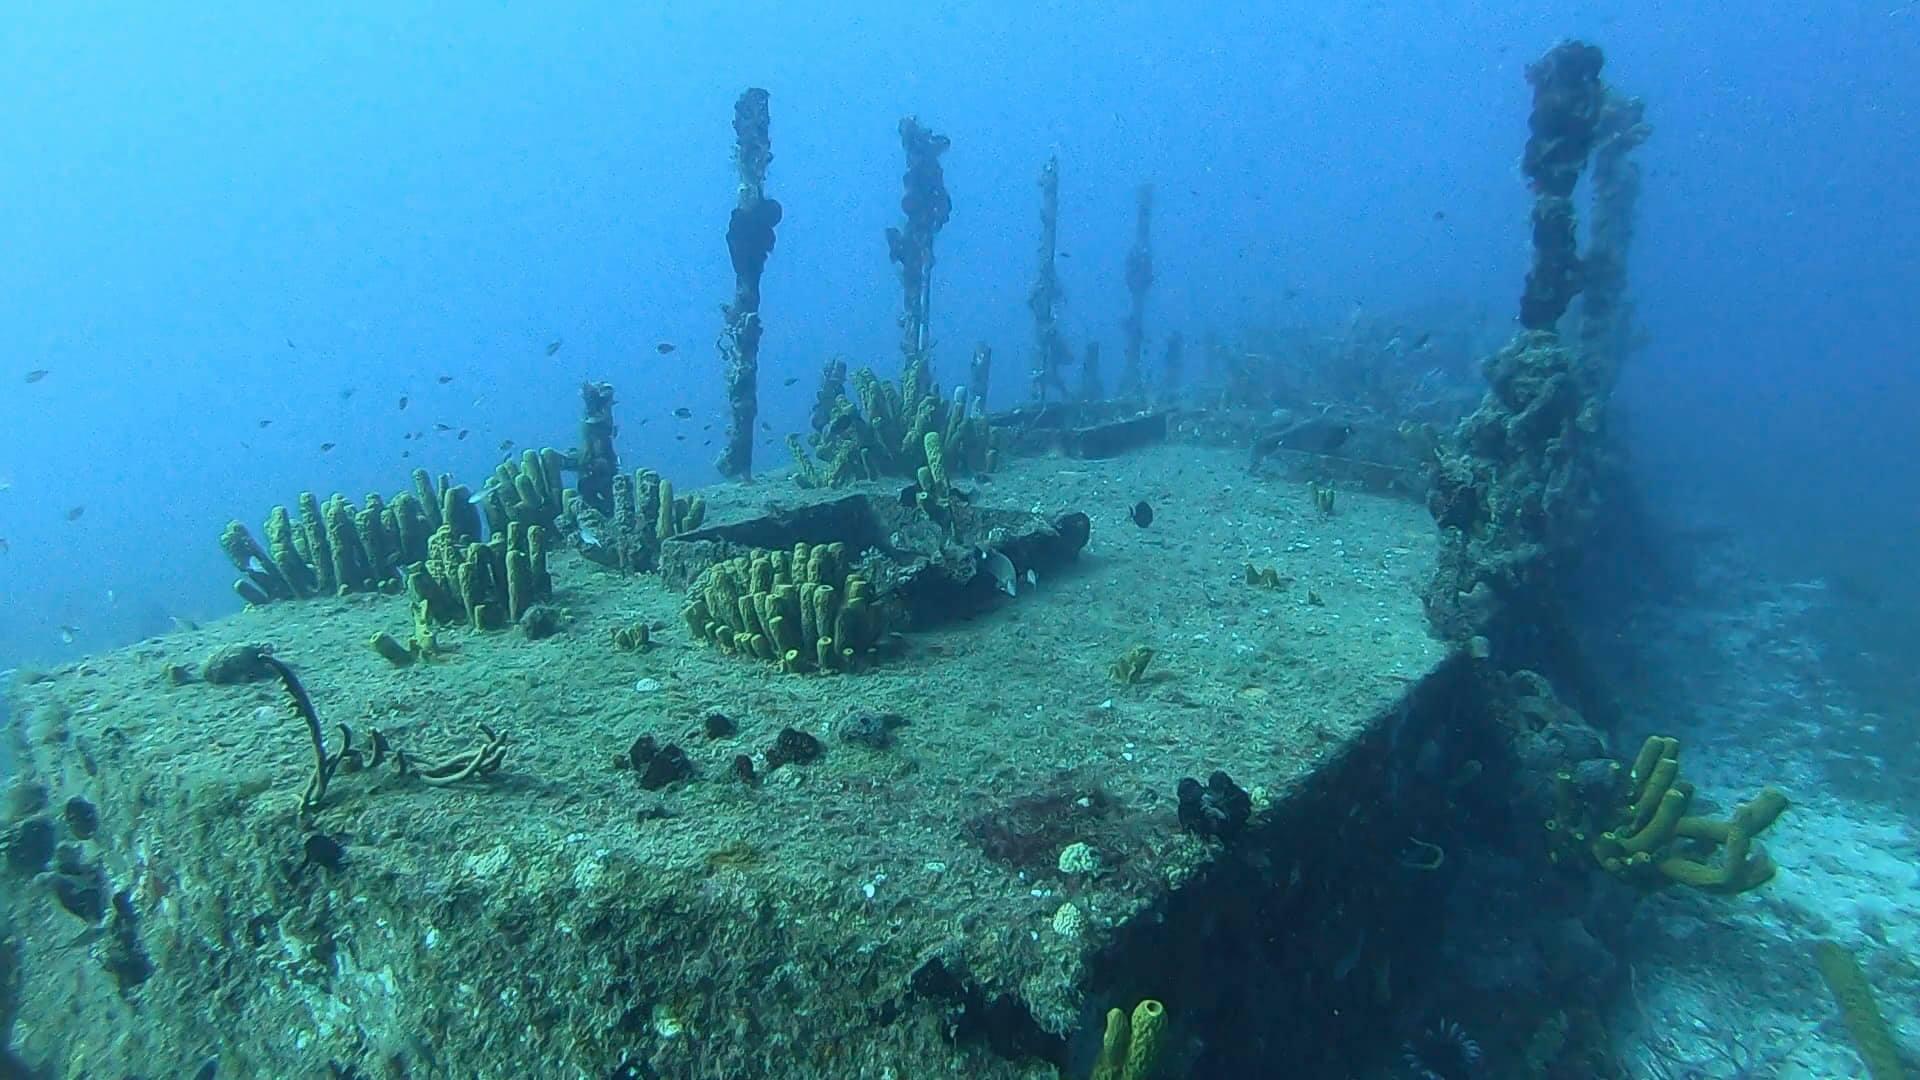 wreck diving dominica salt dive underwater photography roni bat-levi.jpg